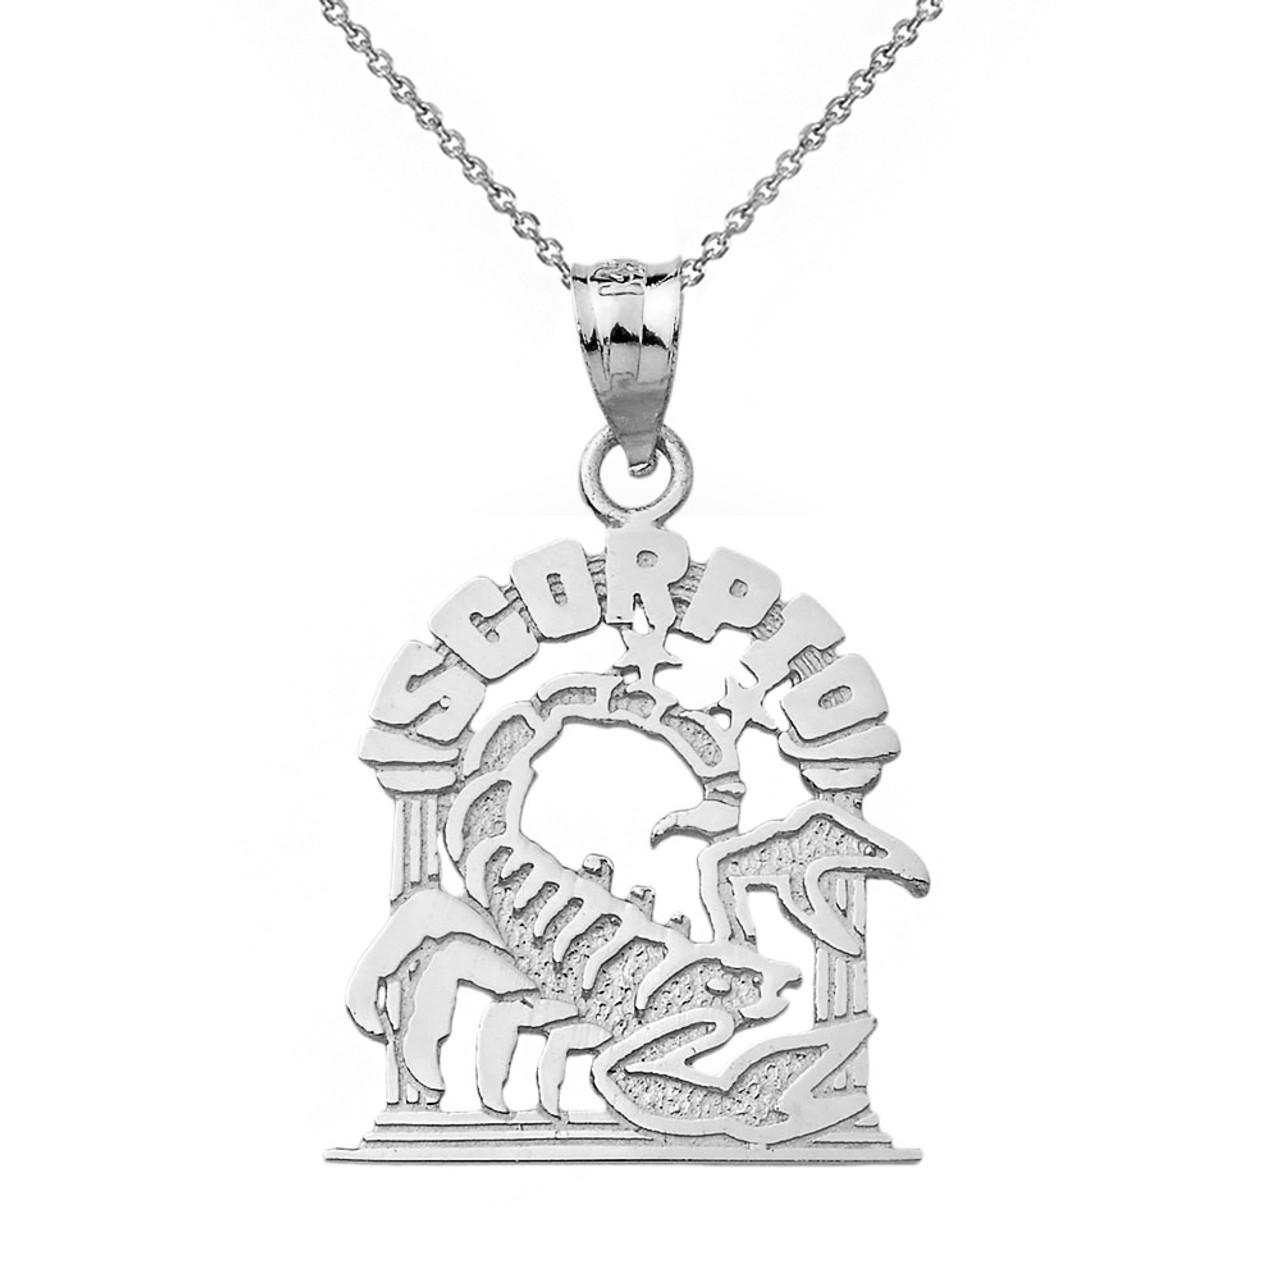 White gold zodiac scorpio pendant necklace solid white gold zodiac scorpio pendant necklace mozeypictures Image collections